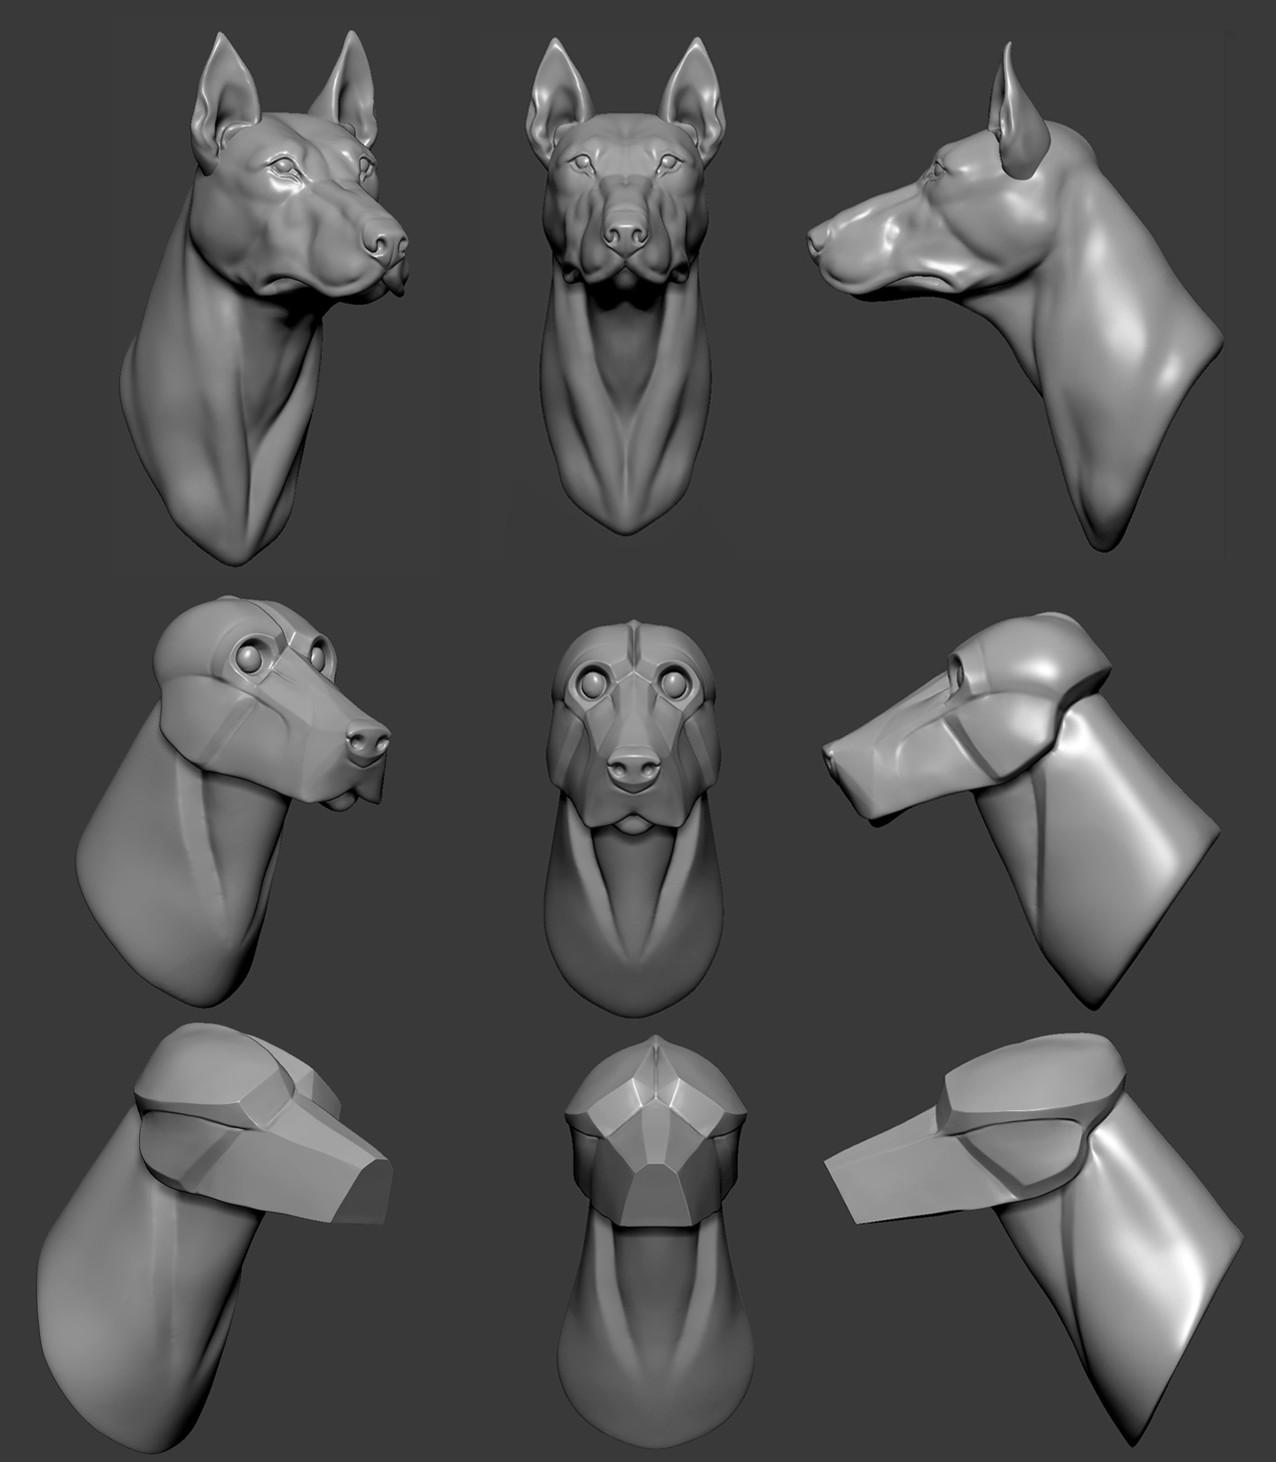 ArtStation - Animal/Creature anatomy studies, Oscar Loris